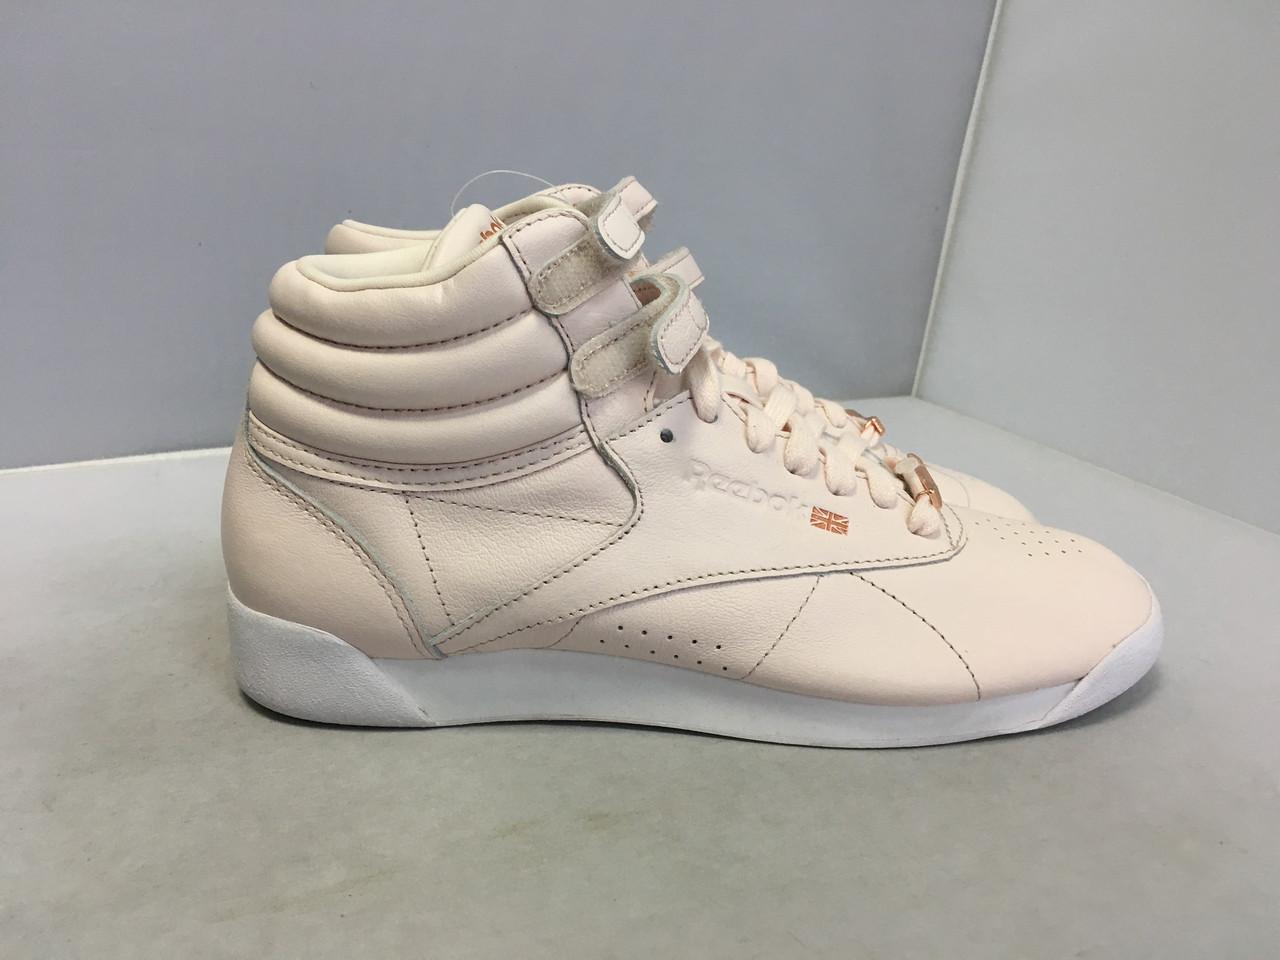 Женские ботинки Reebok, 38 размер